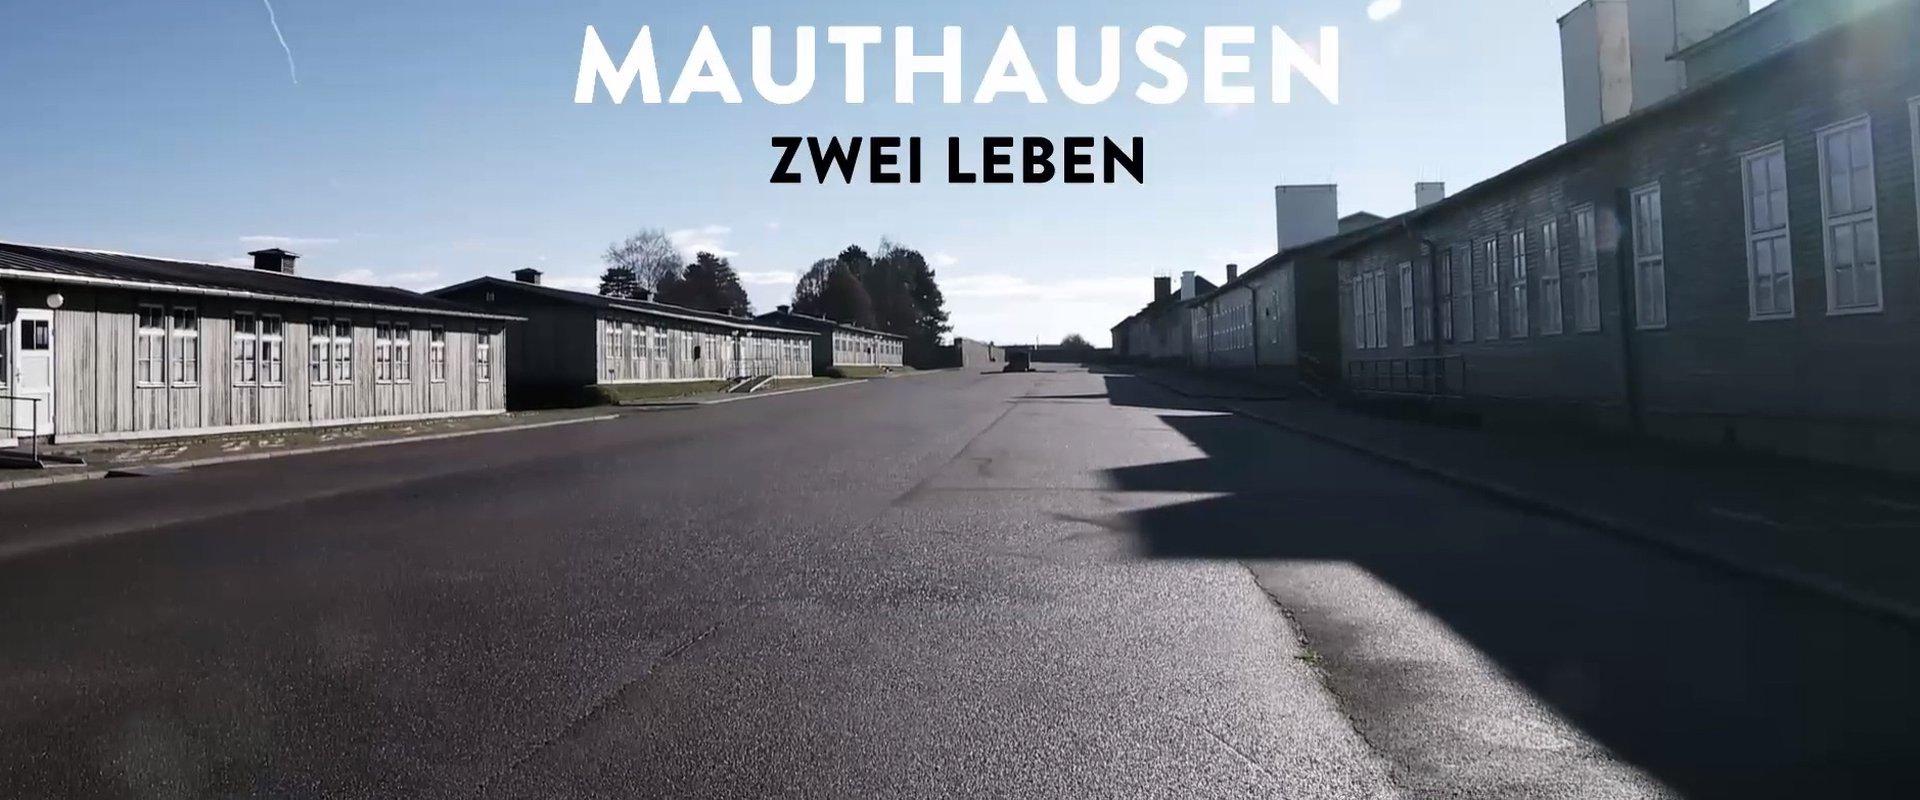 Mauthausen - Zwei Leben